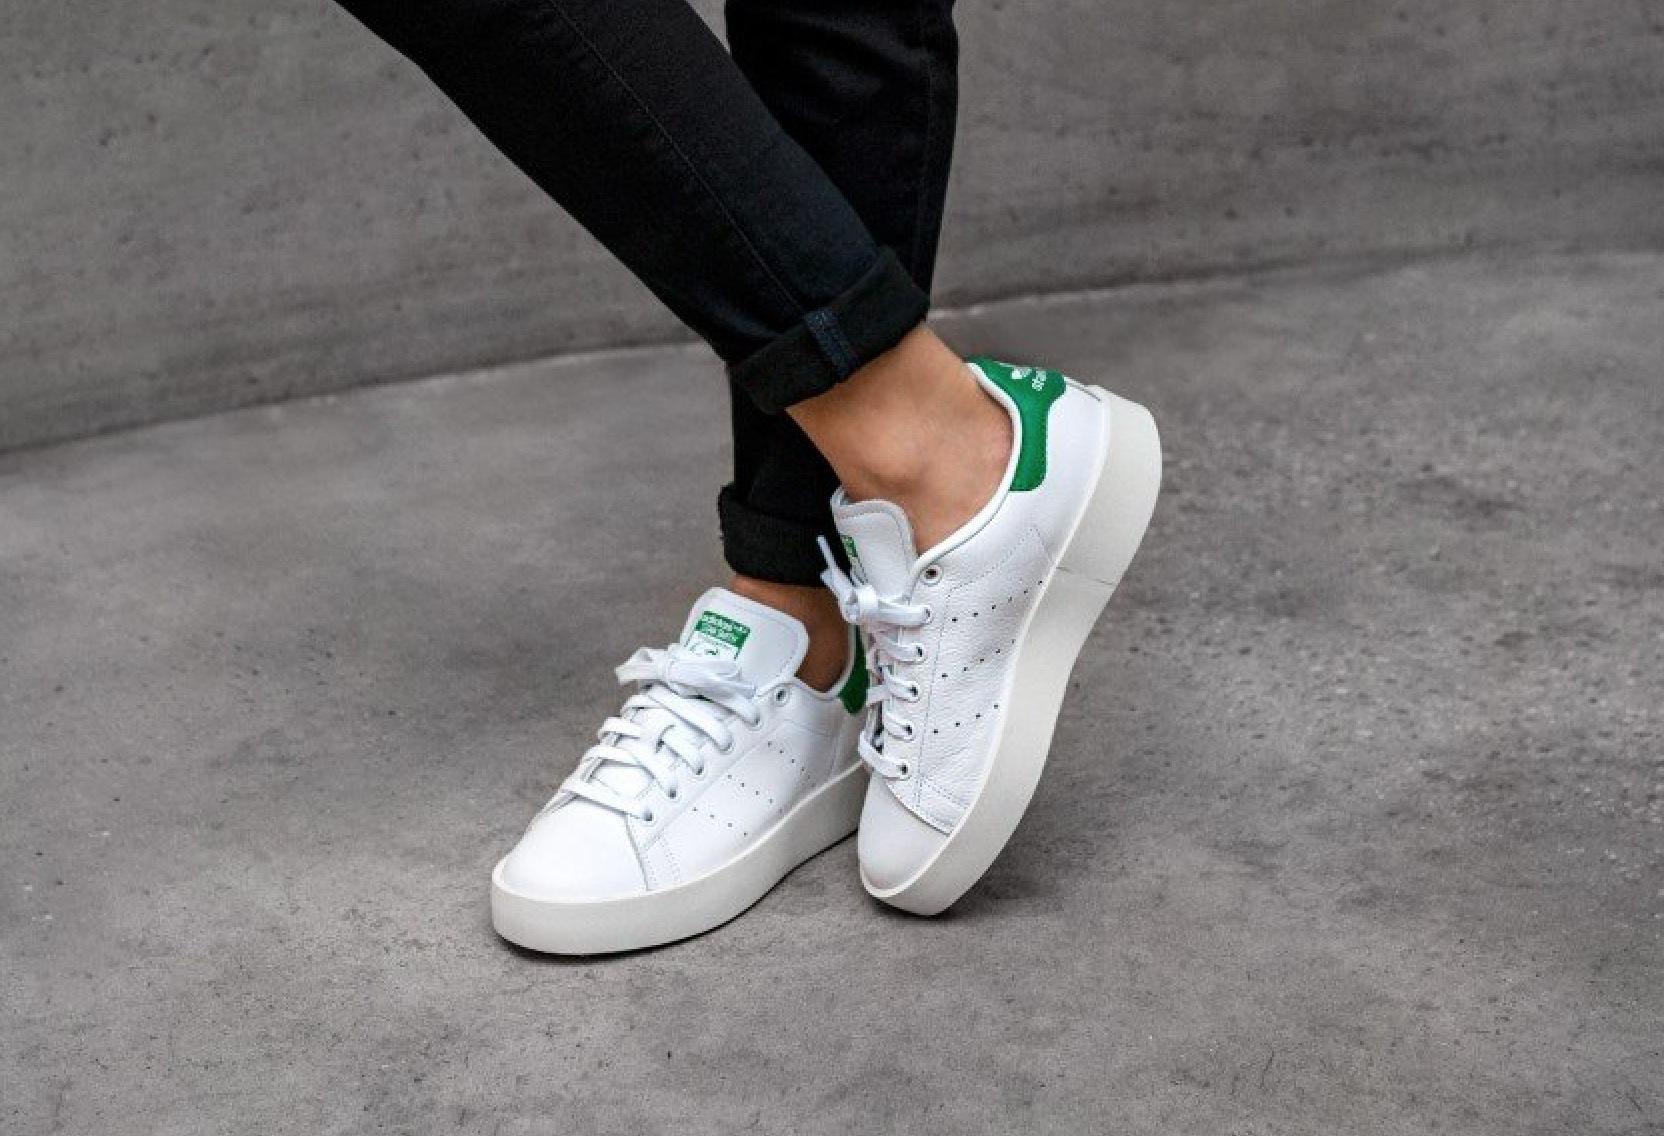 check out hot product huge discount Réduction authentique adidas stan smith plateforme Baskets ...